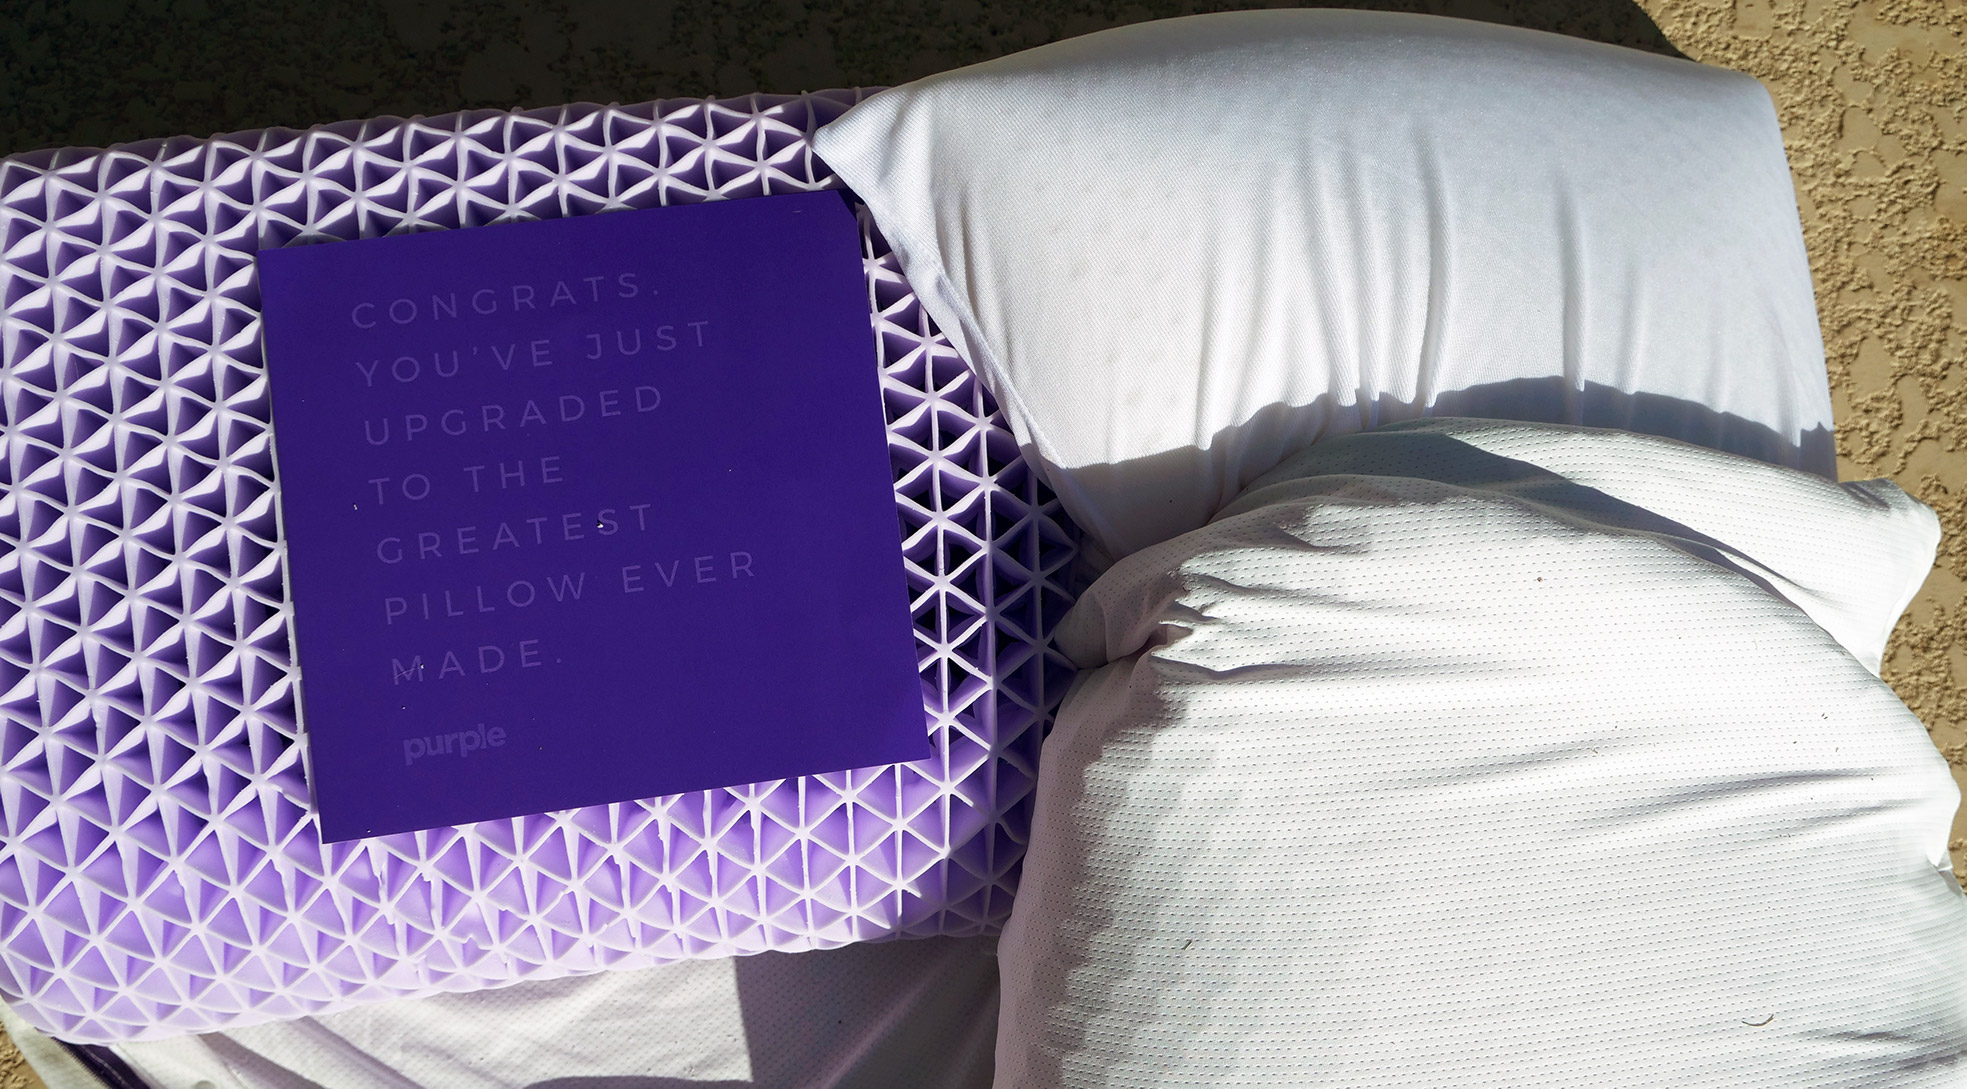 purple pillow review 2021 non